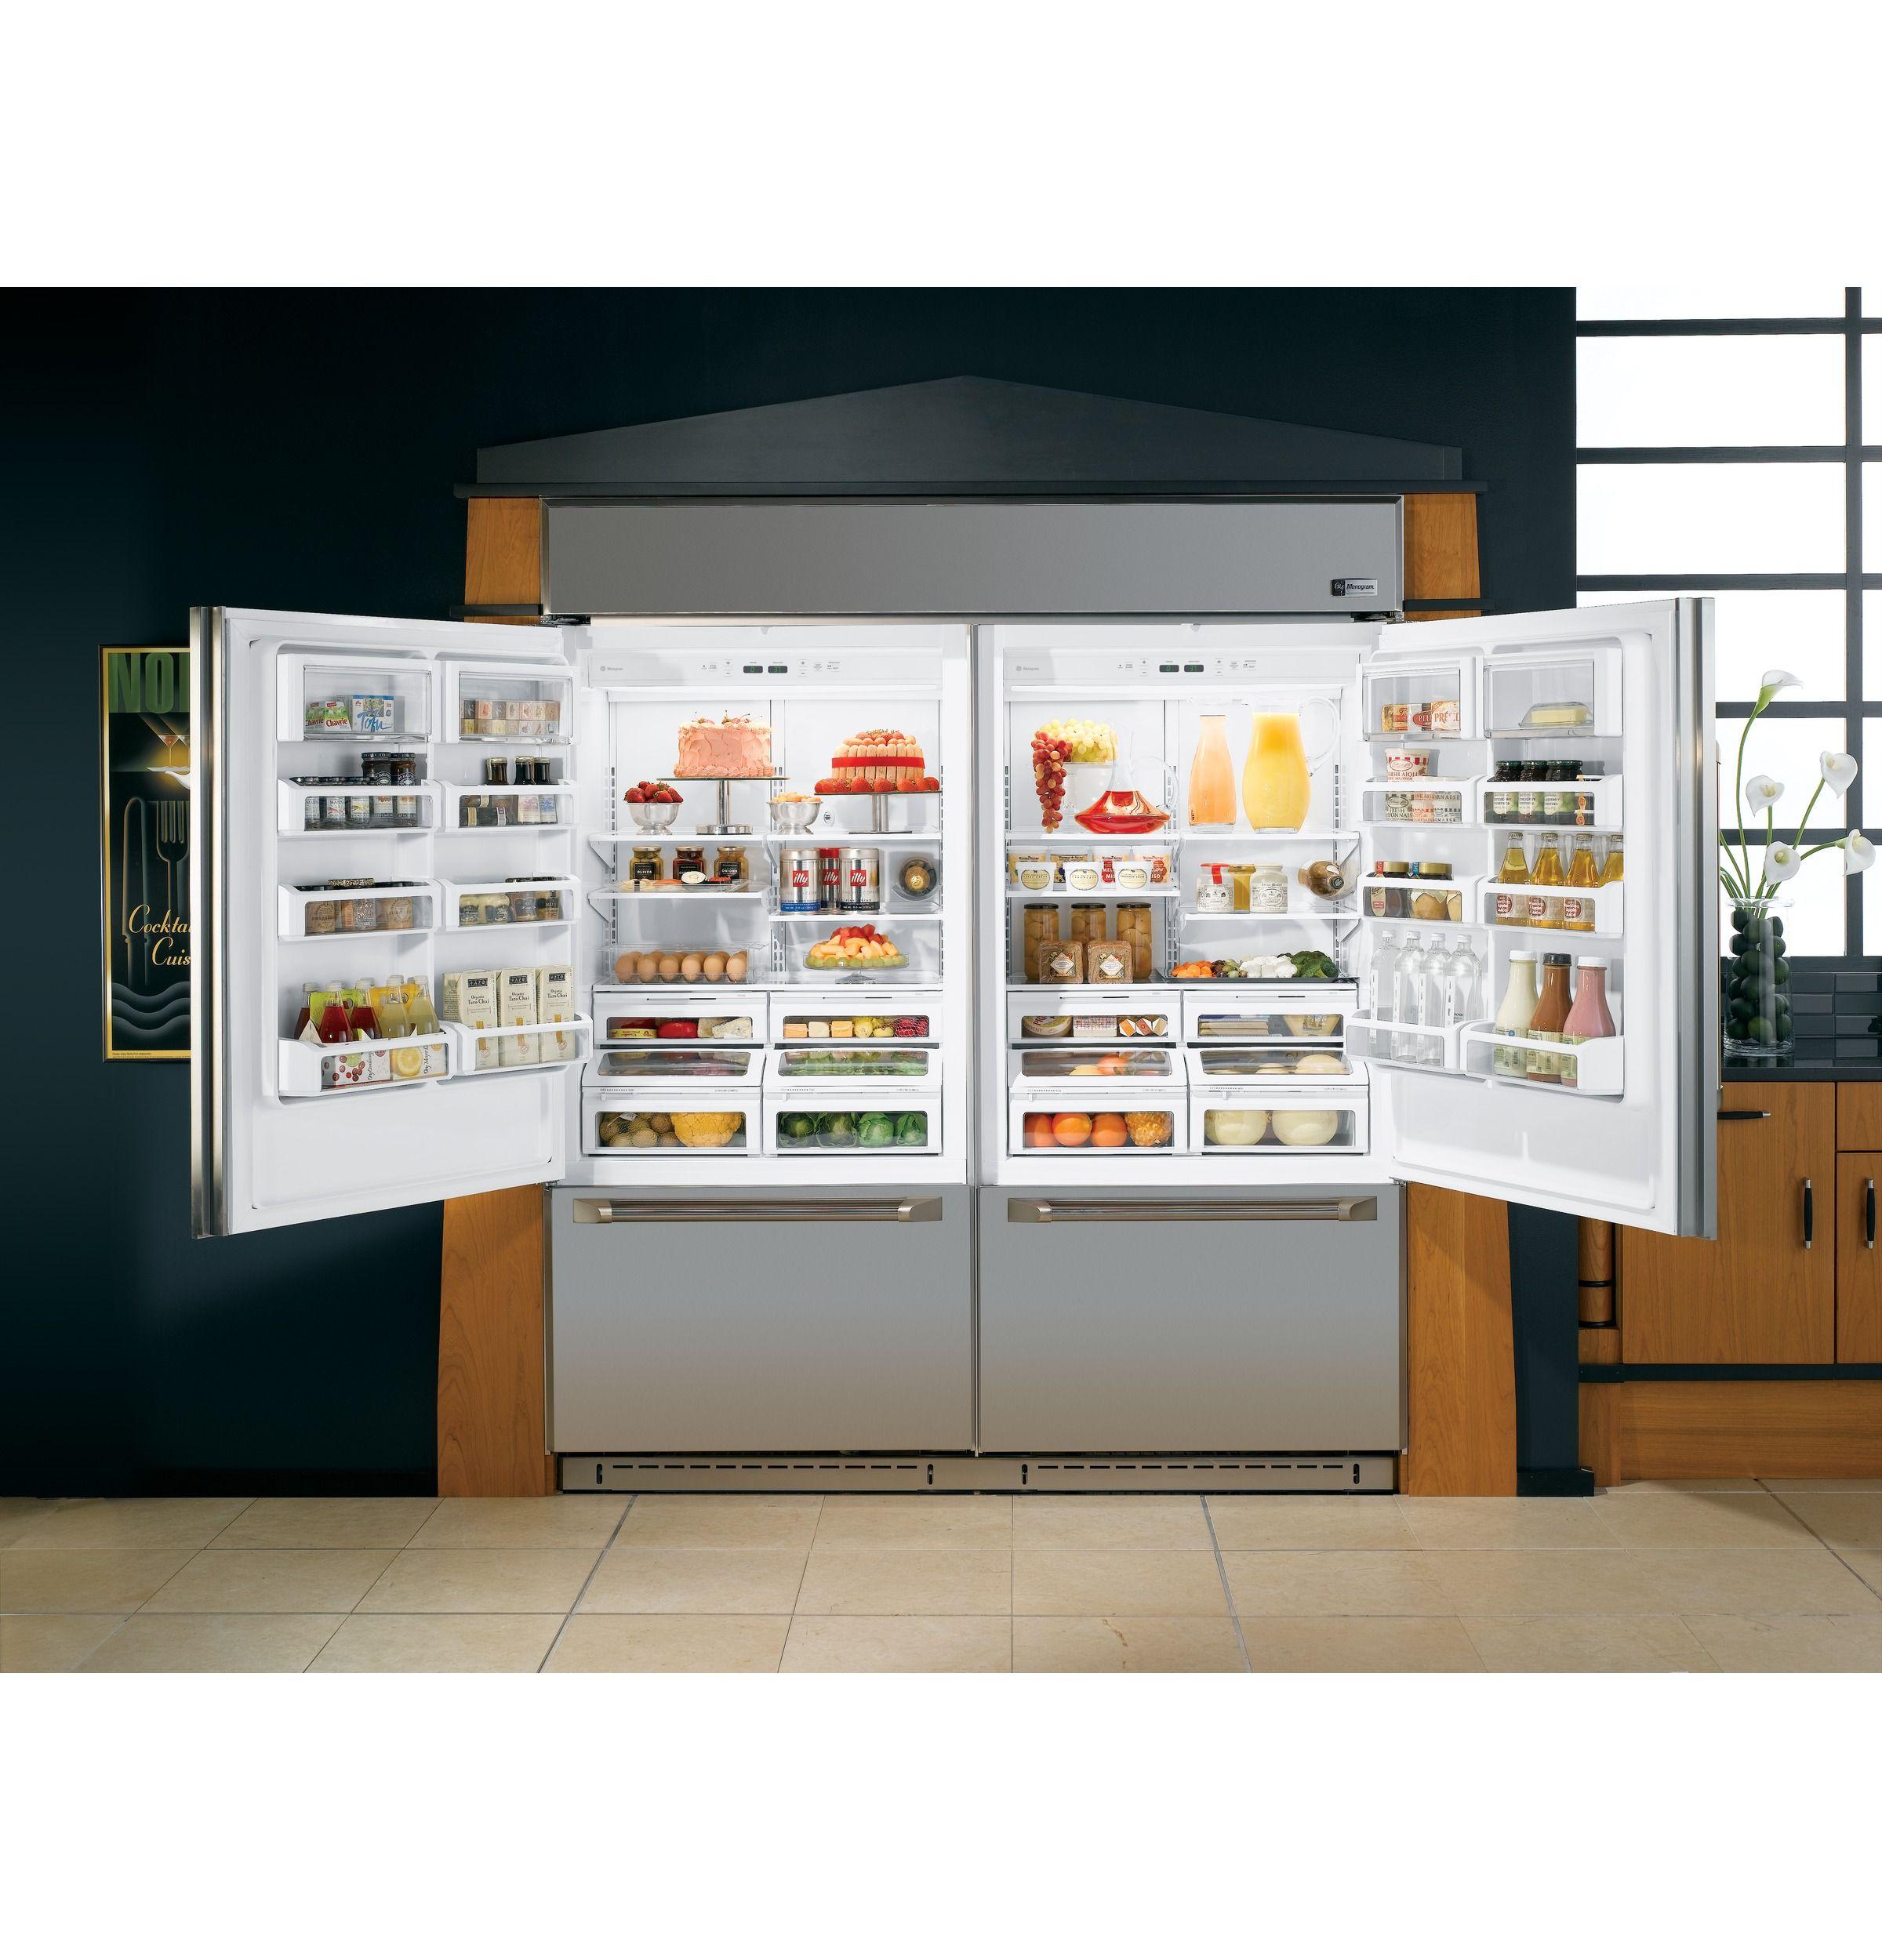 Ge Monogram 72 Professional Built In Bottom Freezer Refrigerator